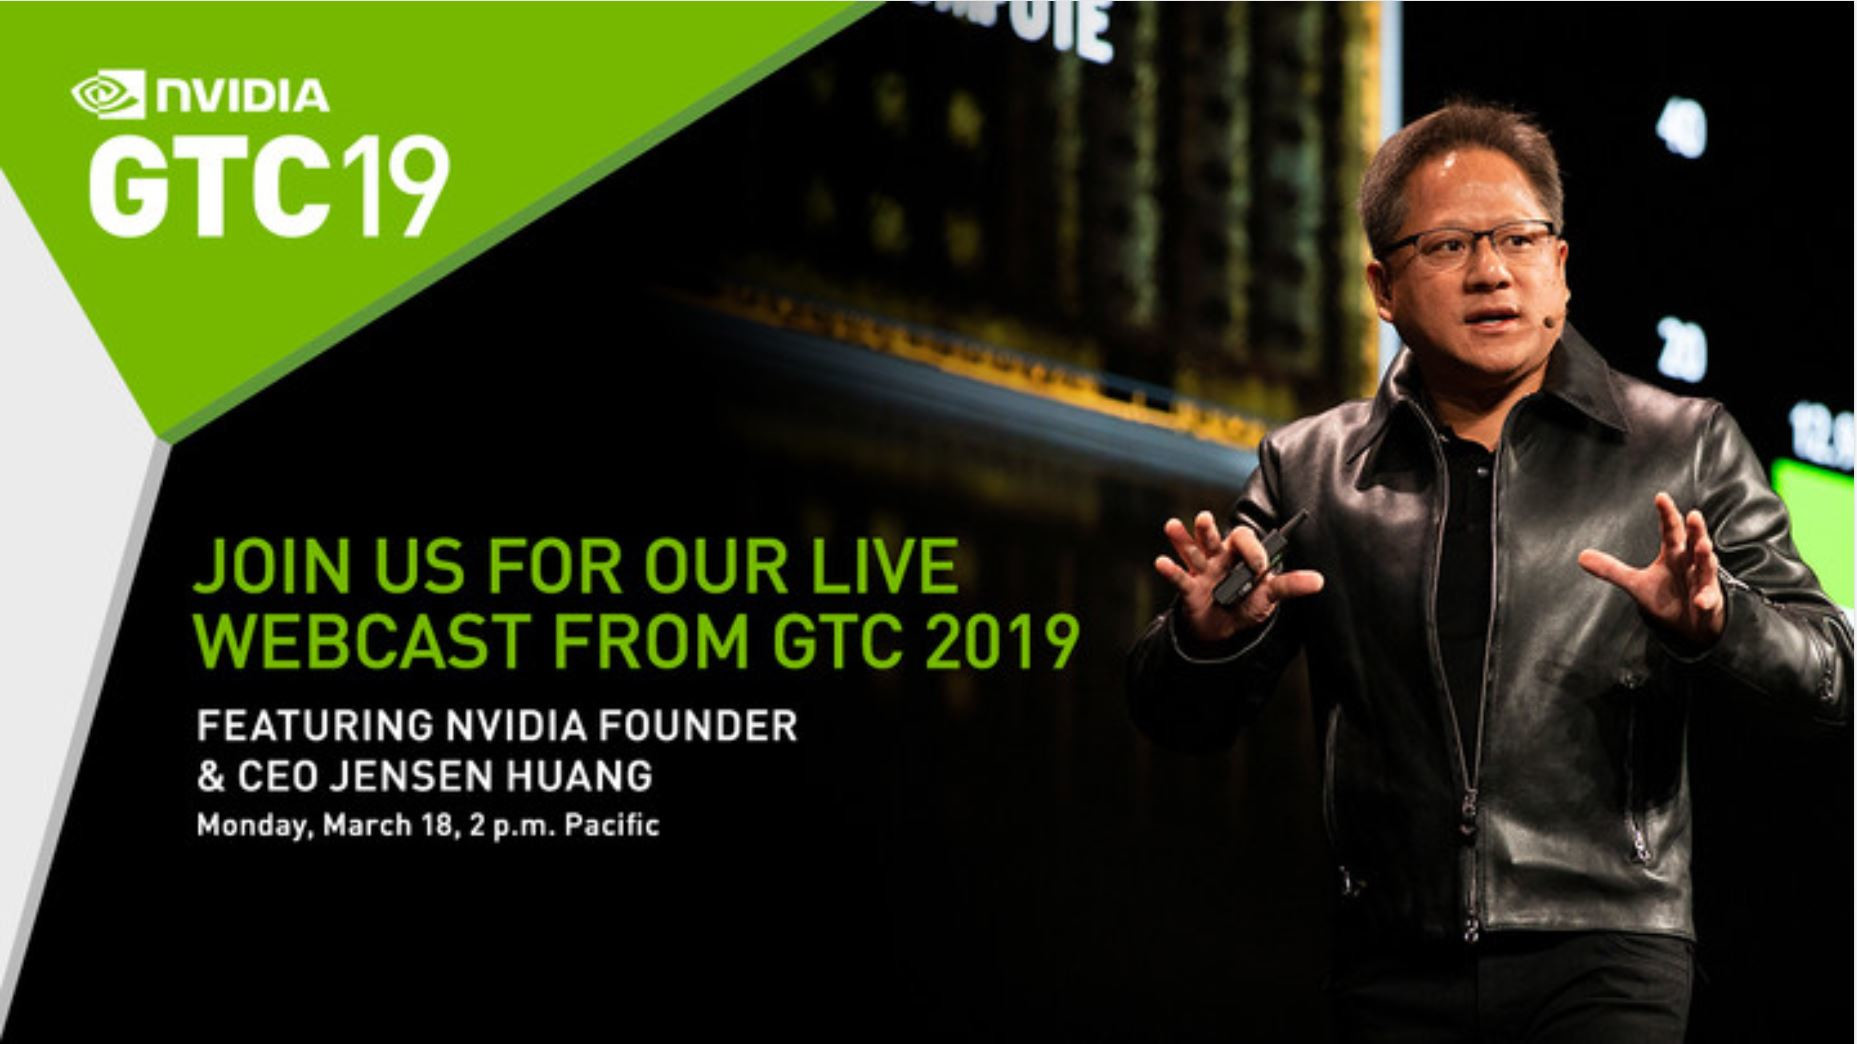 NVIDIA GTC 2019 Kicks Off Later Today, New GPU Architecture Tease